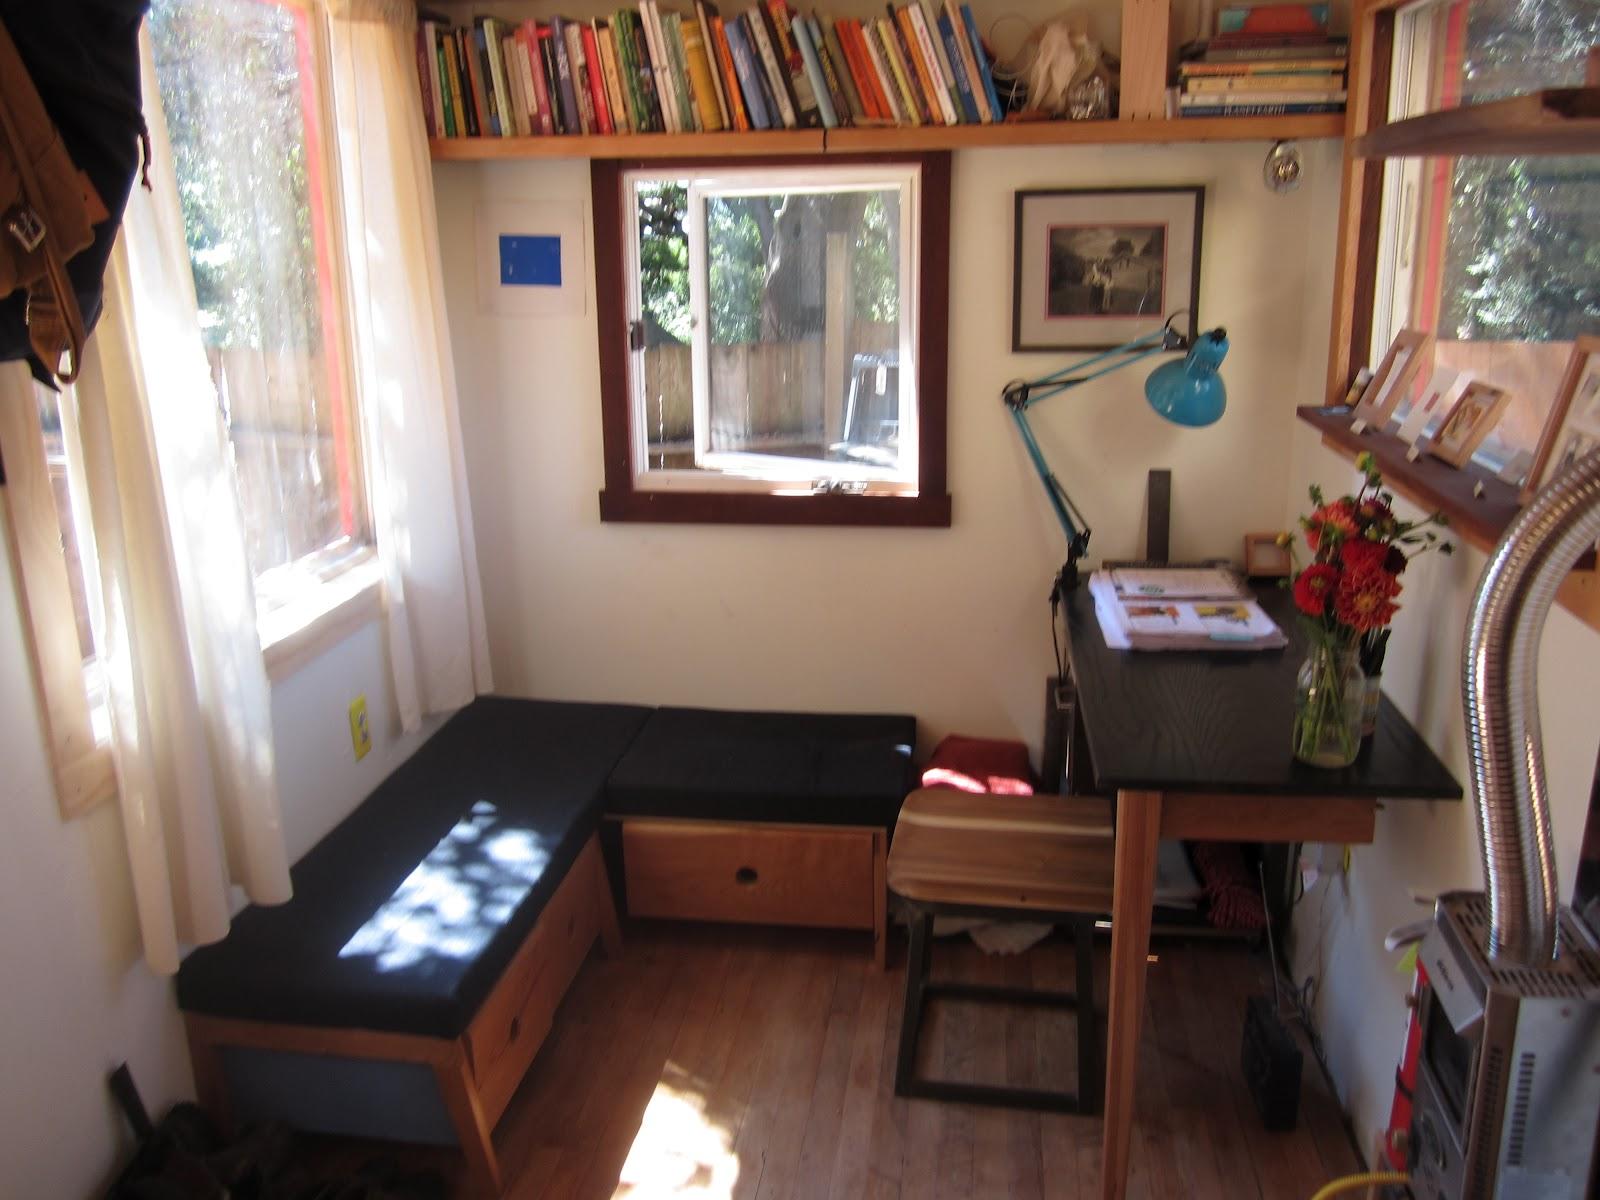 Tiny Home Designs: Oakland Tiny House